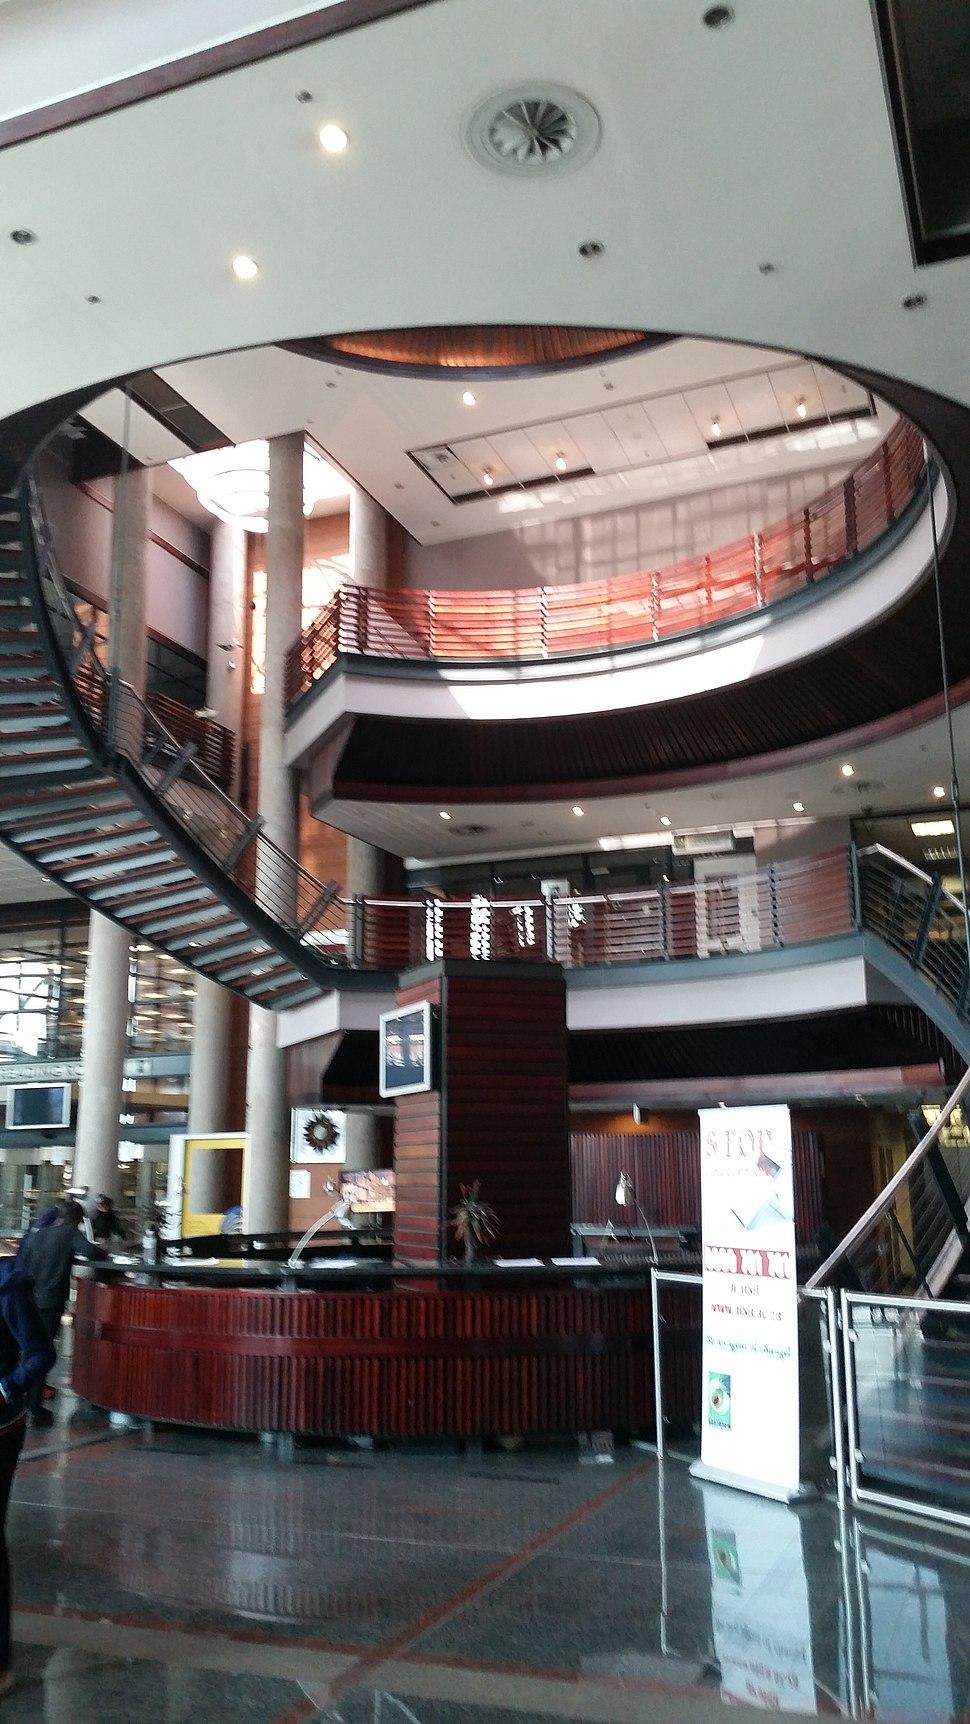 National Library of South Africa, Pretoria